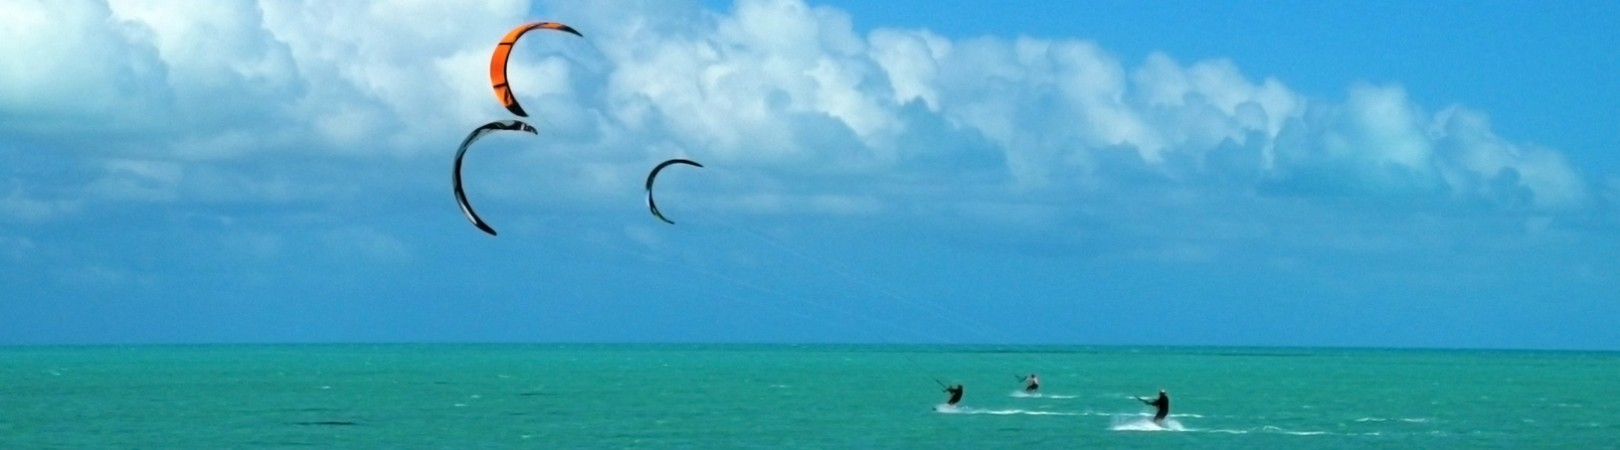 Turks-and-Caicos-Kiteboarding